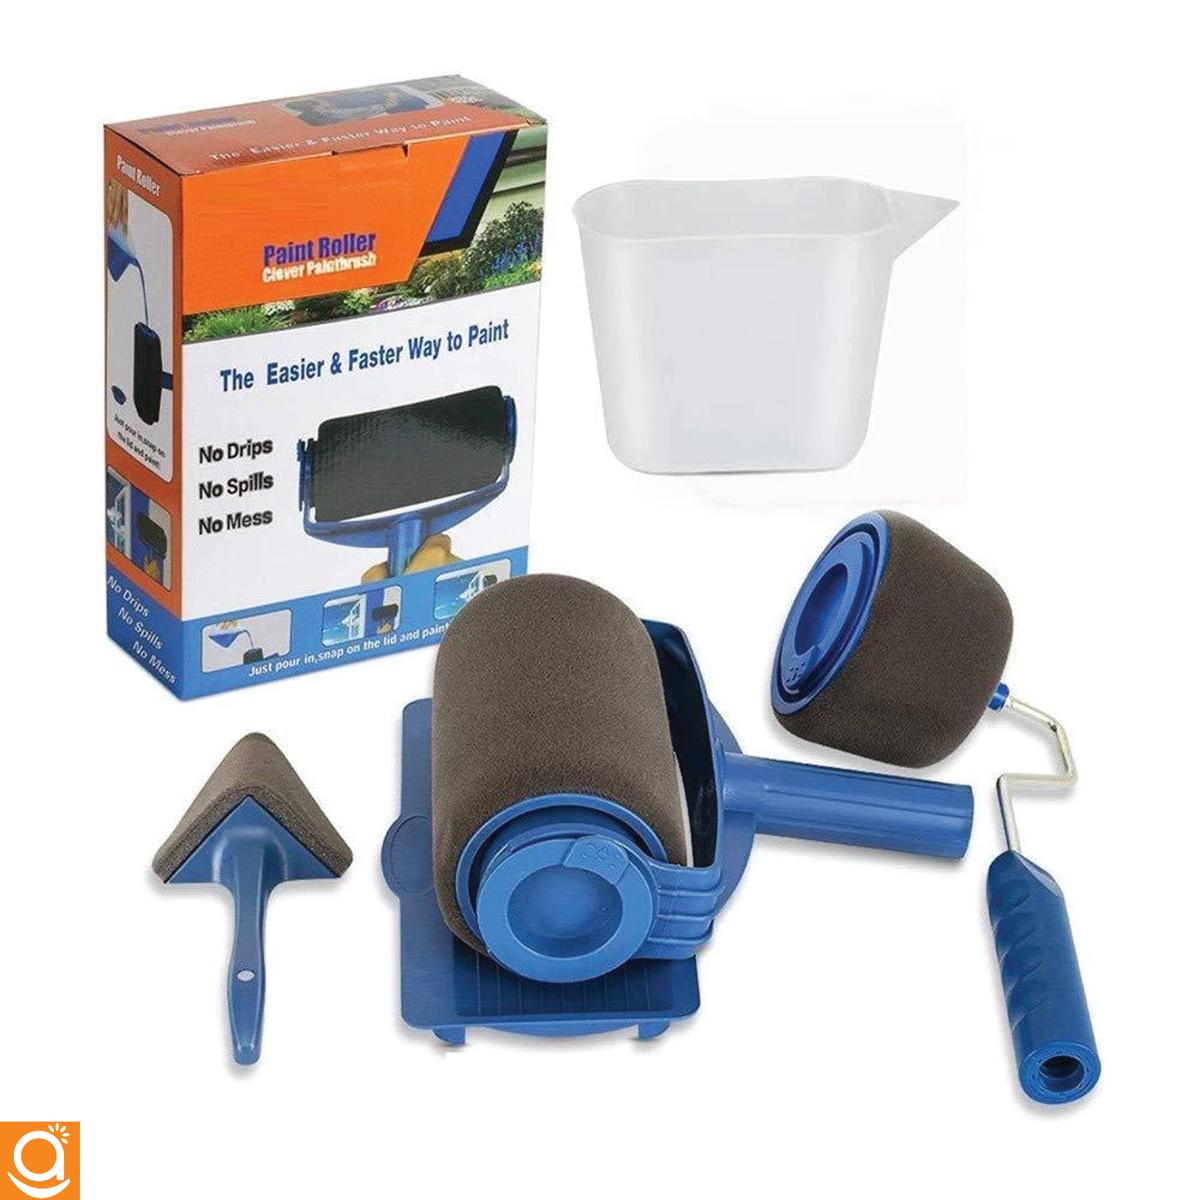 Painte Multifunctional Paint Roller Pro Kit In 2020 Paint Roller Roller Brush Paint Runner